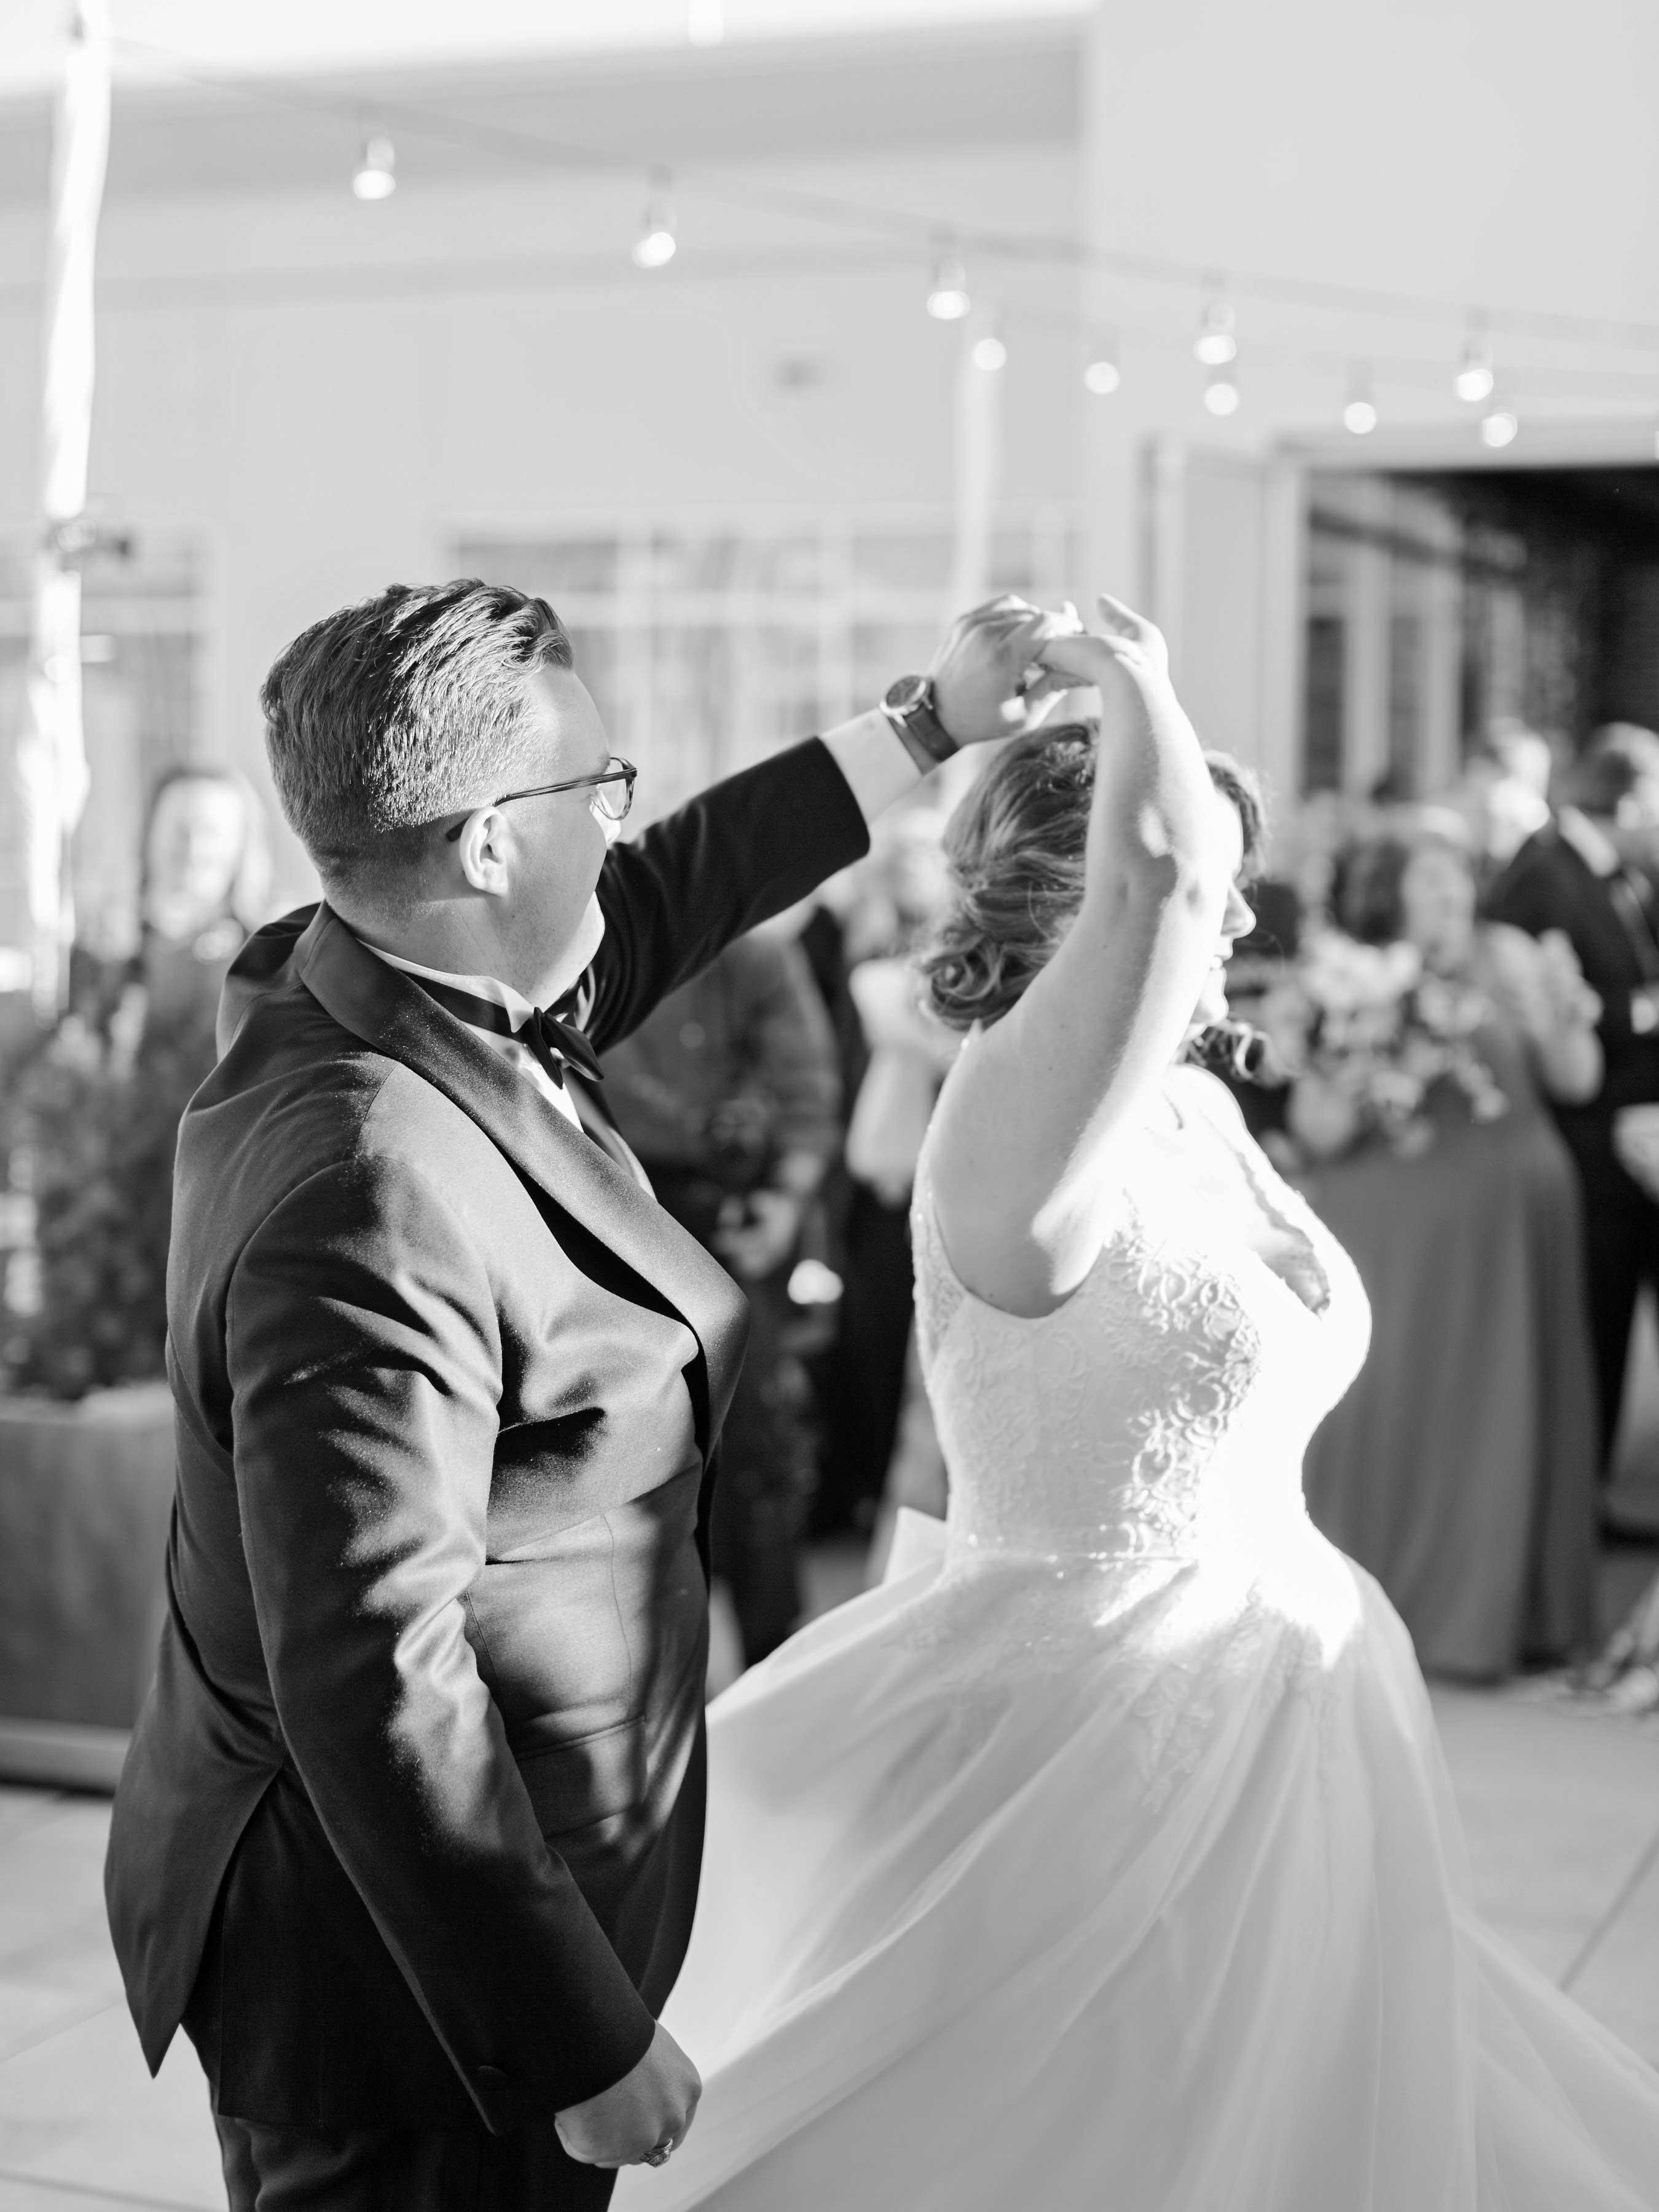 carey jared wedding first dance